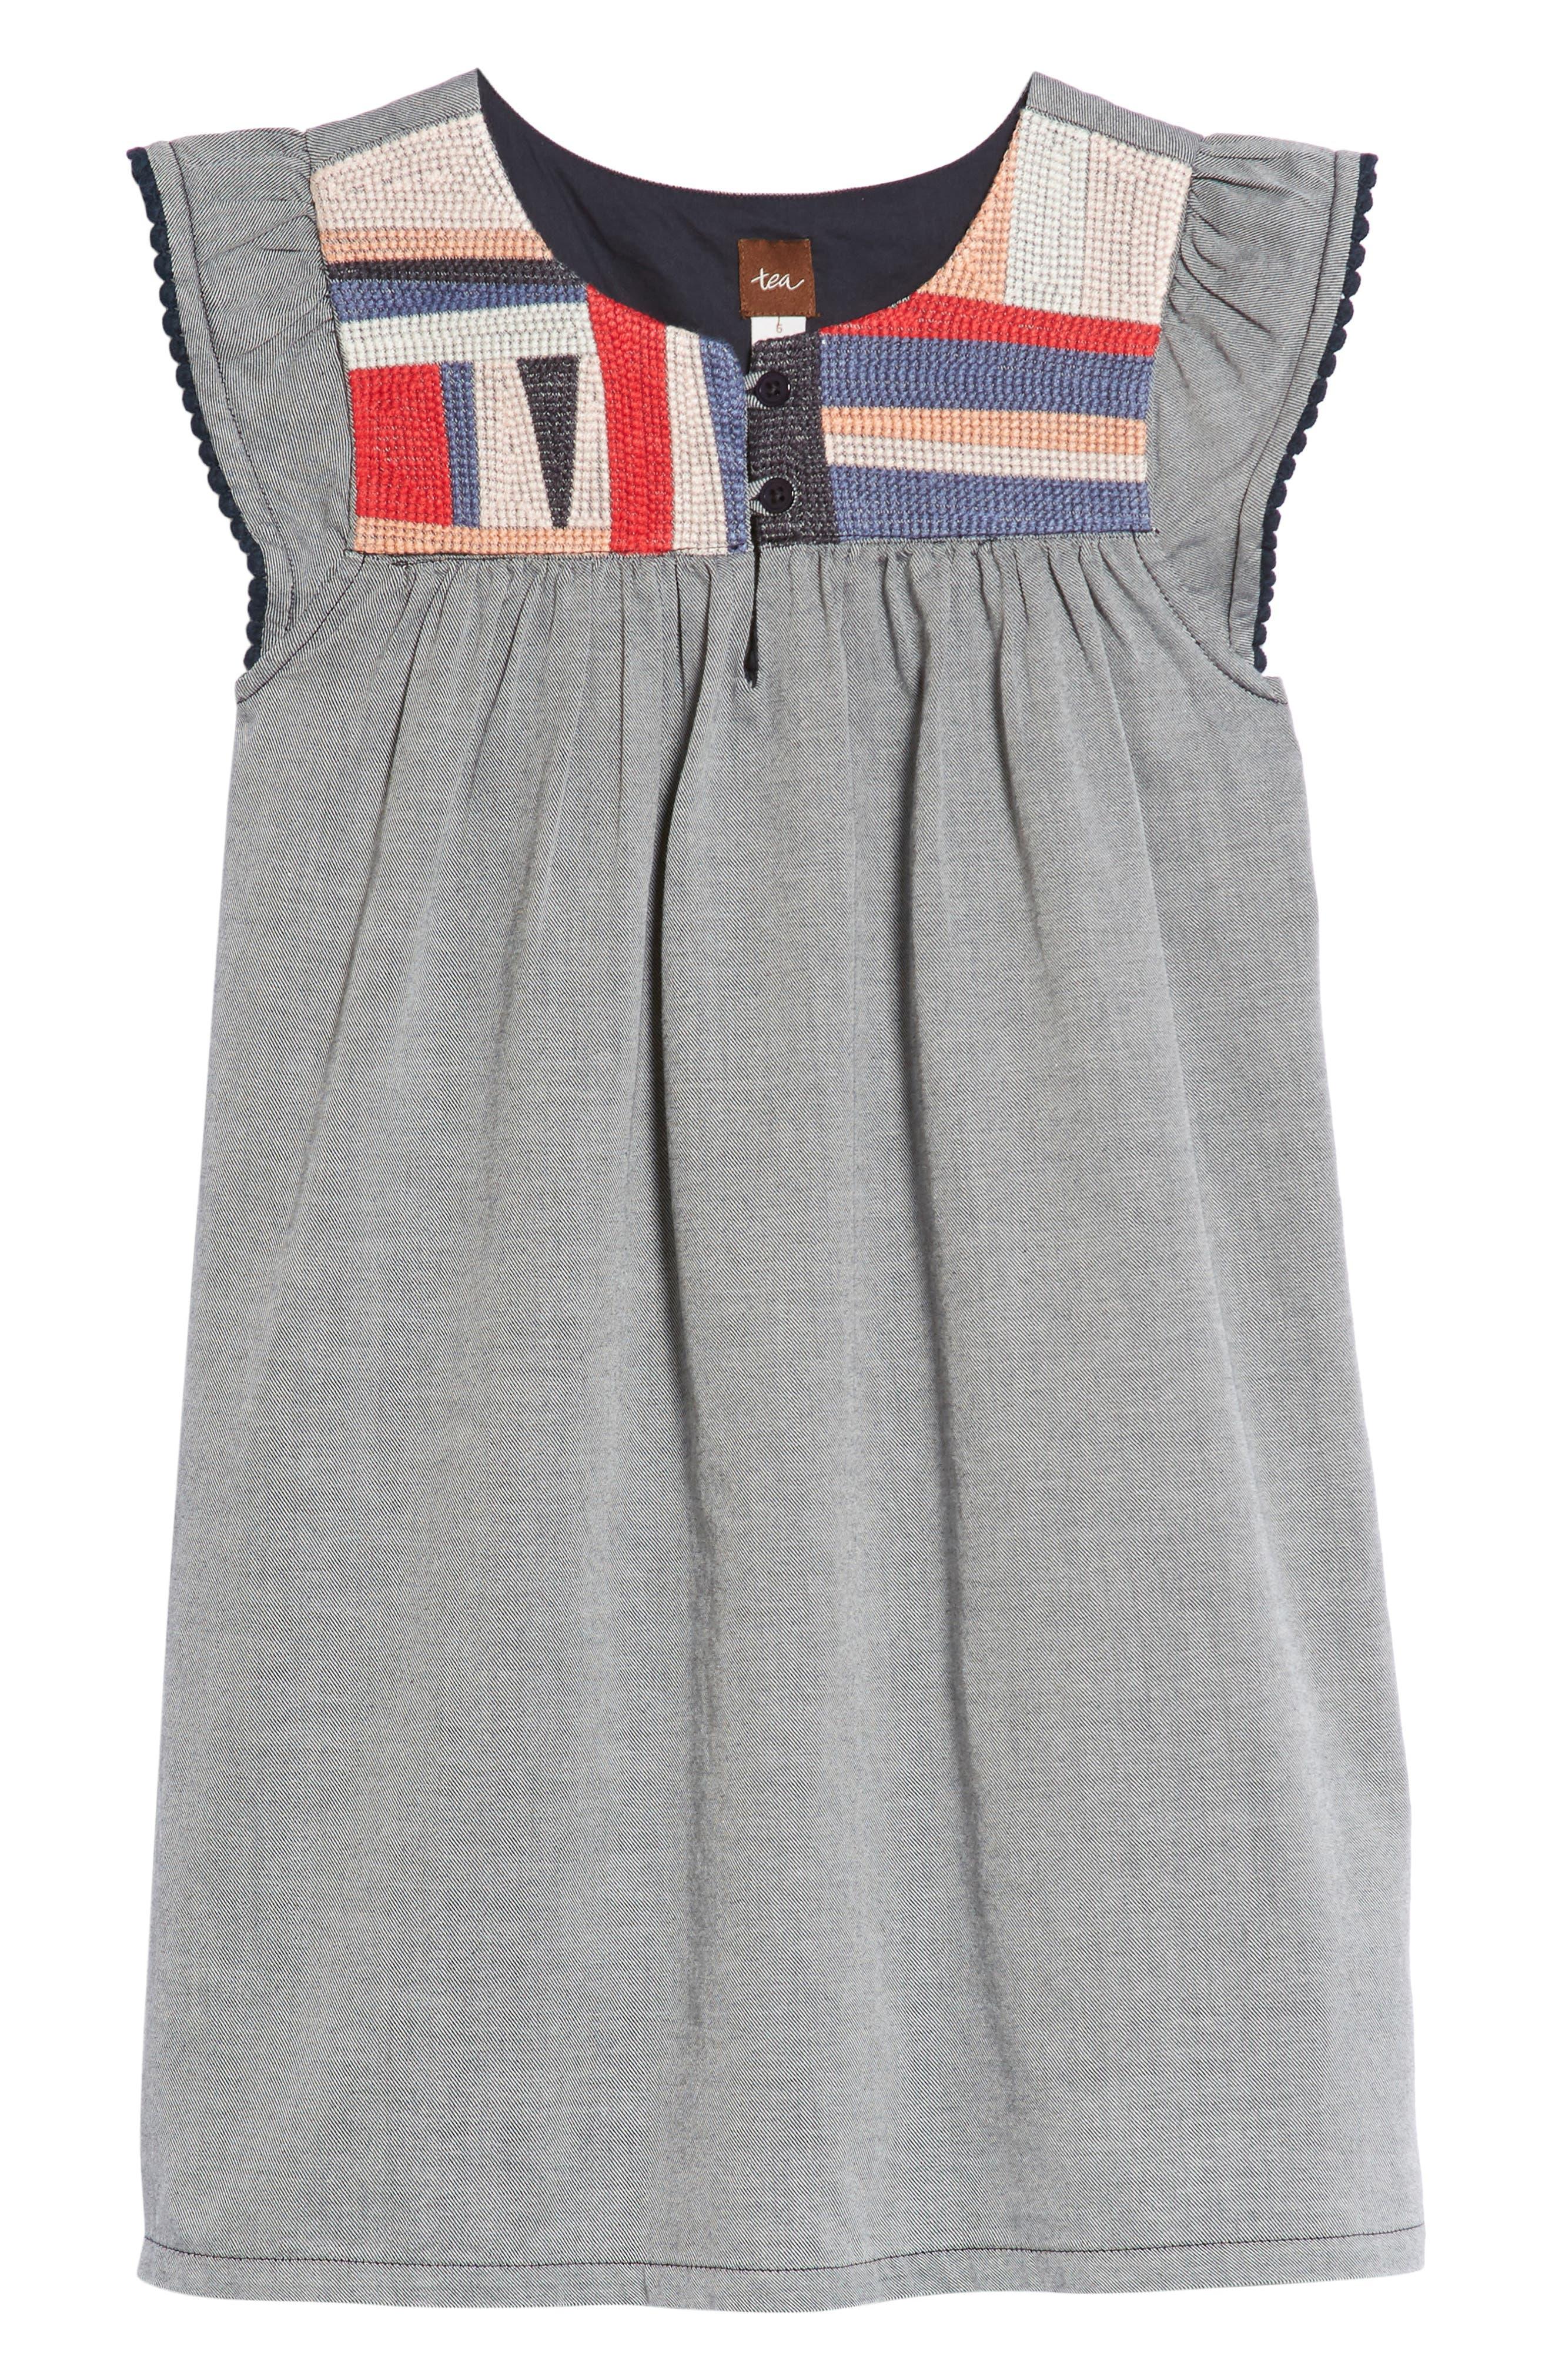 Main Image - Tea Collection Embroidered Yoke Shift Dress (Toddler Girls, Little Girls & Big Girls)